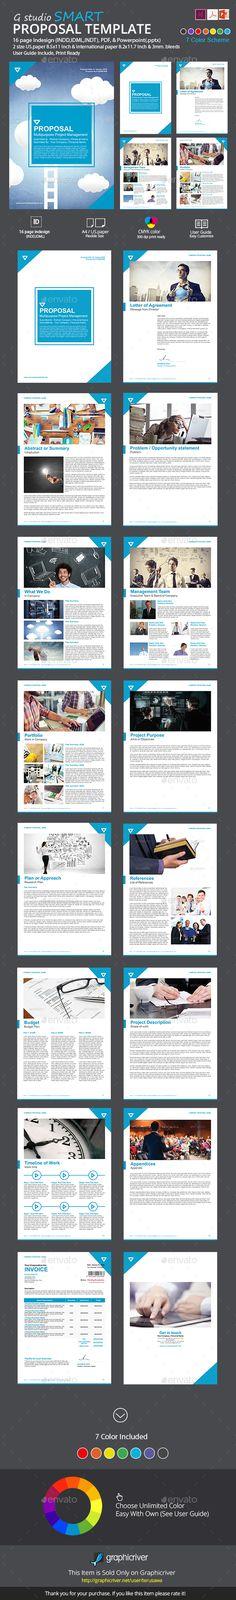 Company Proposal Template Proposal templates, Branding design - company proposal template